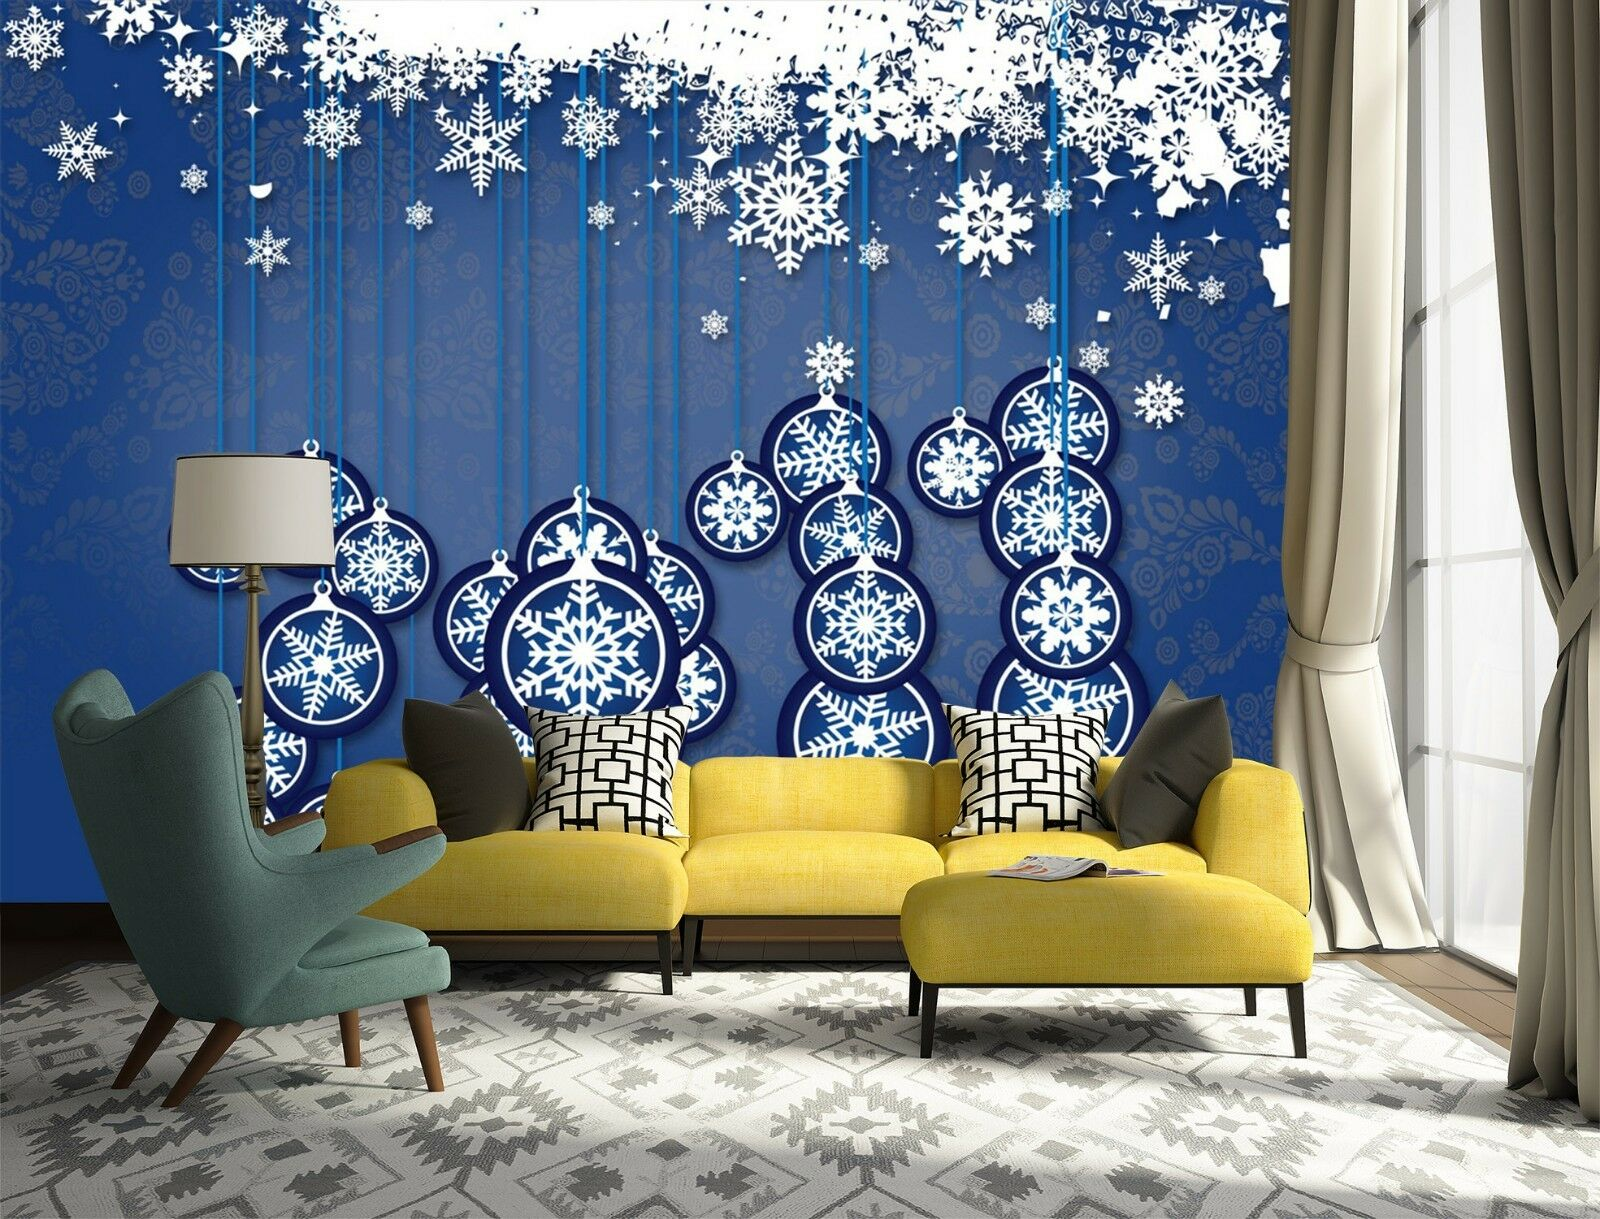 3D Cartoon small snowflakes Wall Paper Print Decal Wall Deco Indoor wall Mural